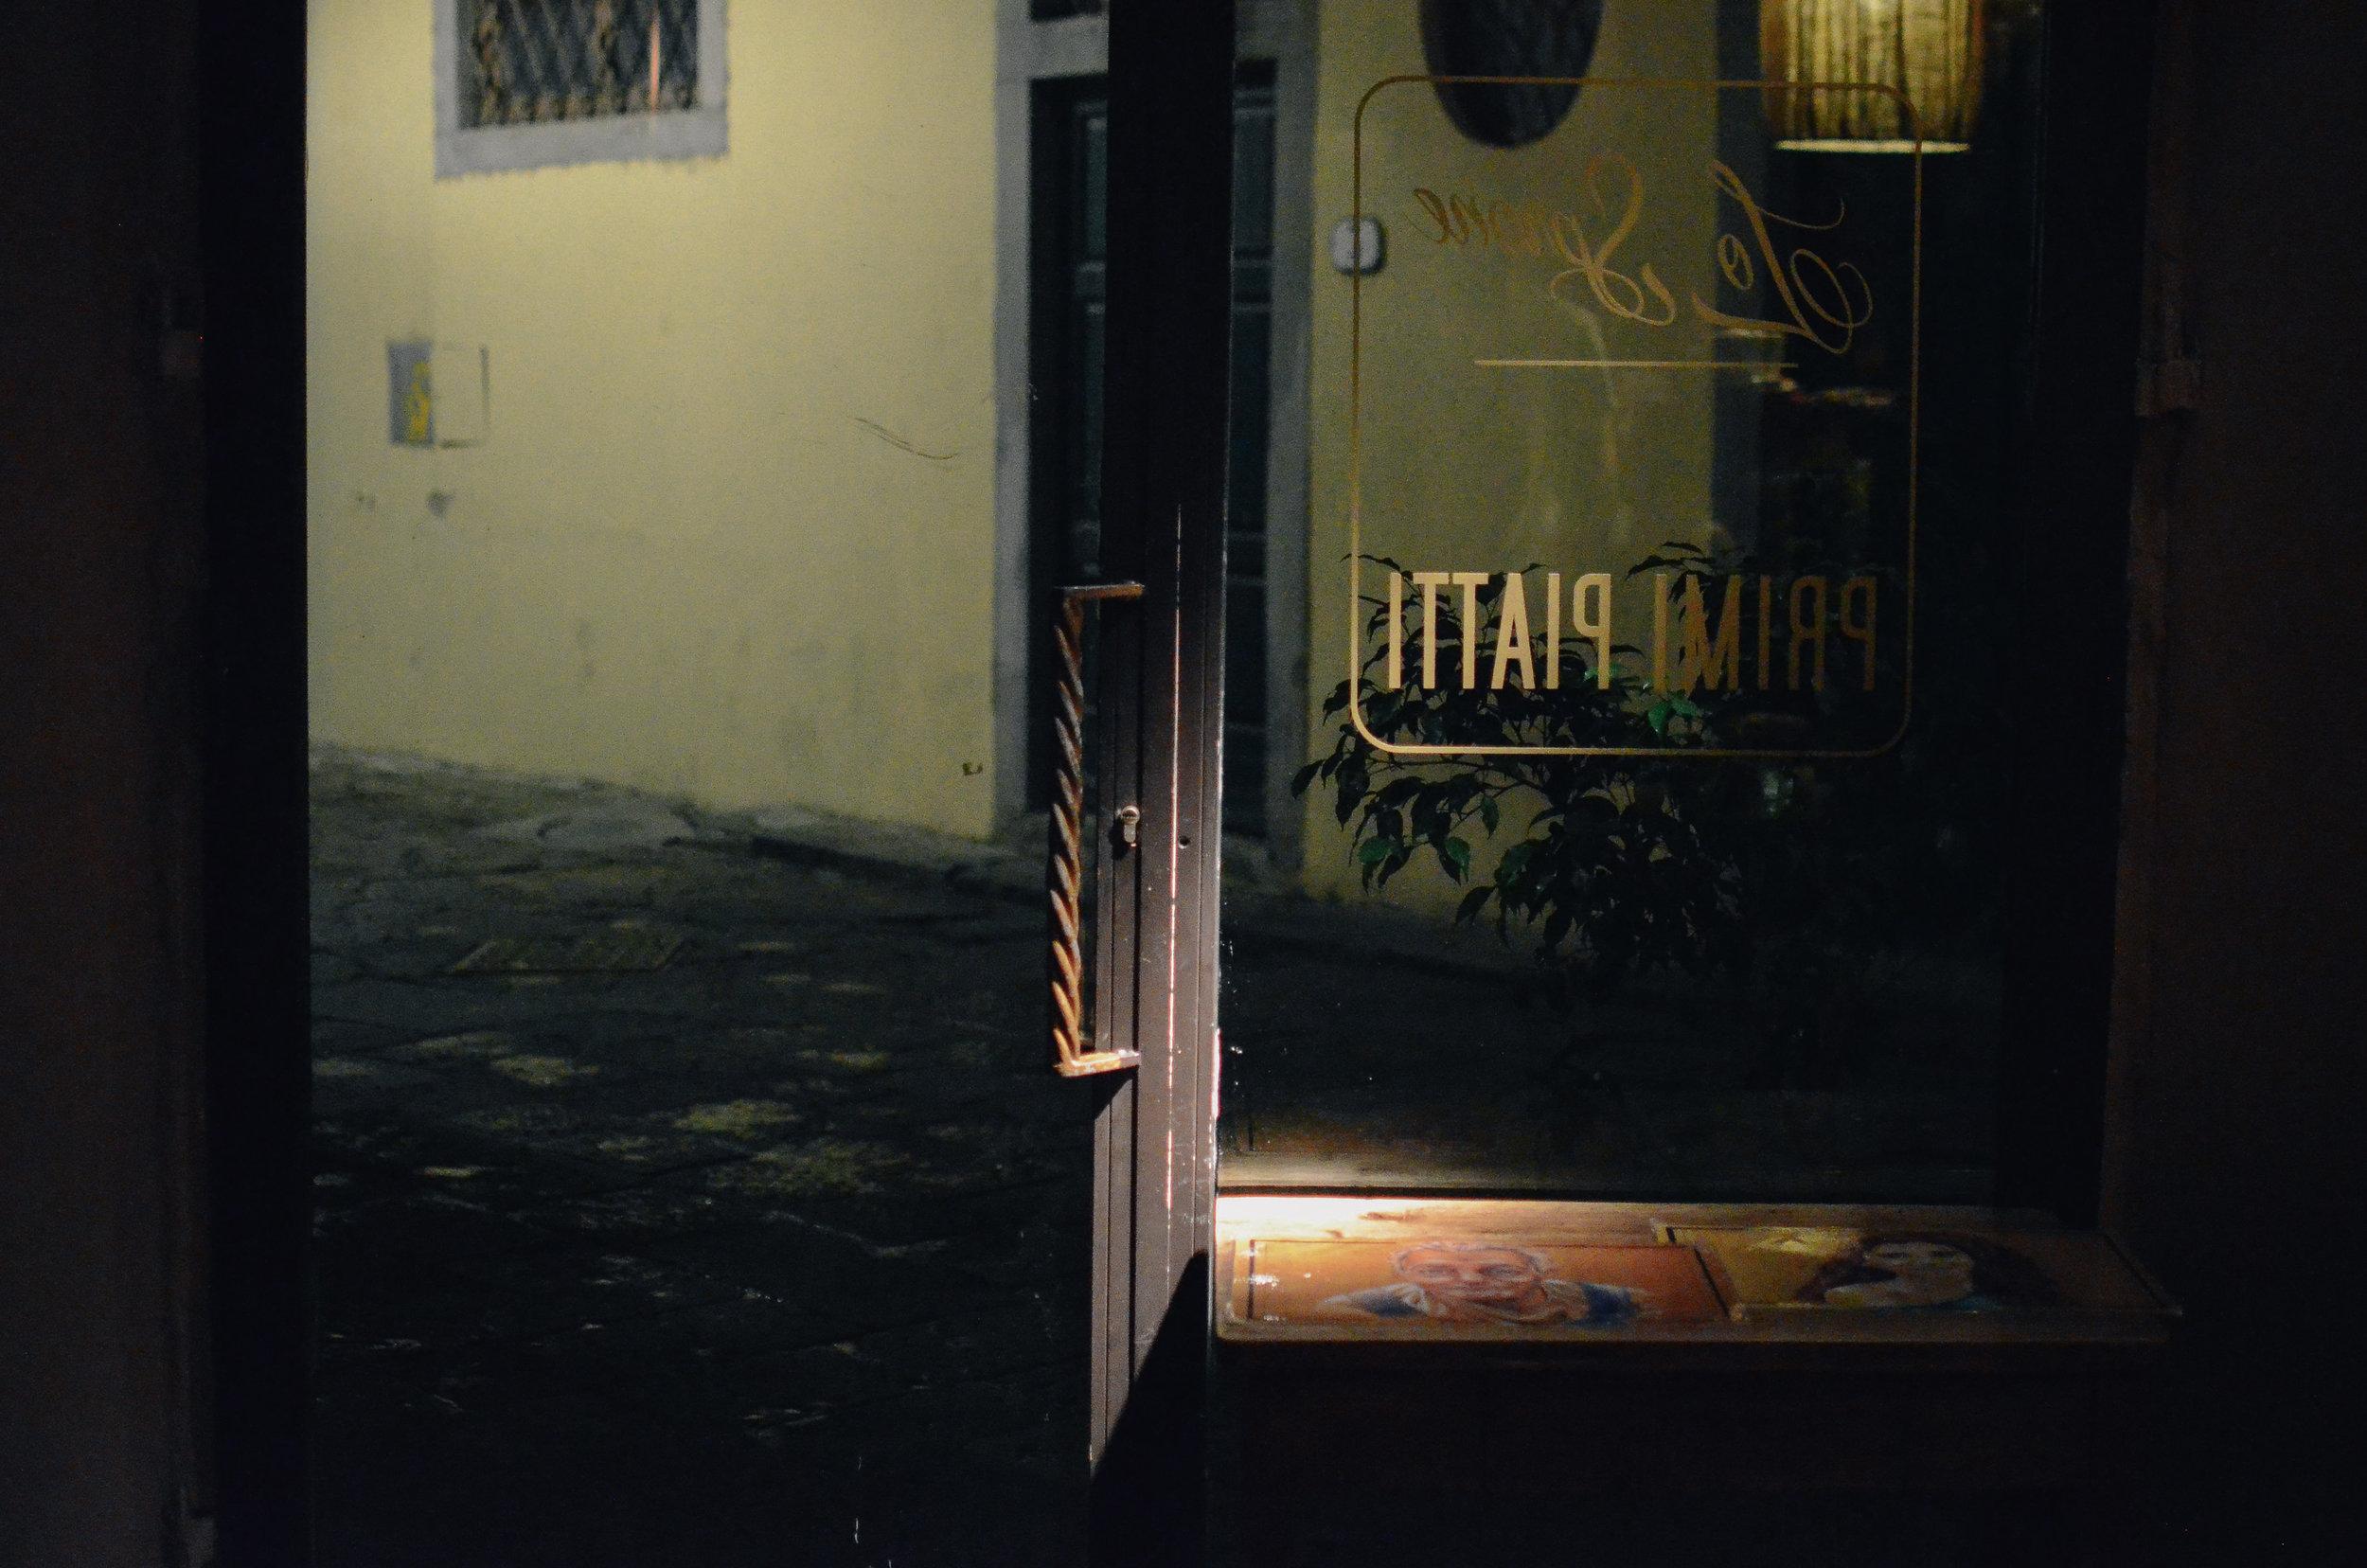 florence-italy-travel-guide-adventure-blog_DSC_0106.jpg